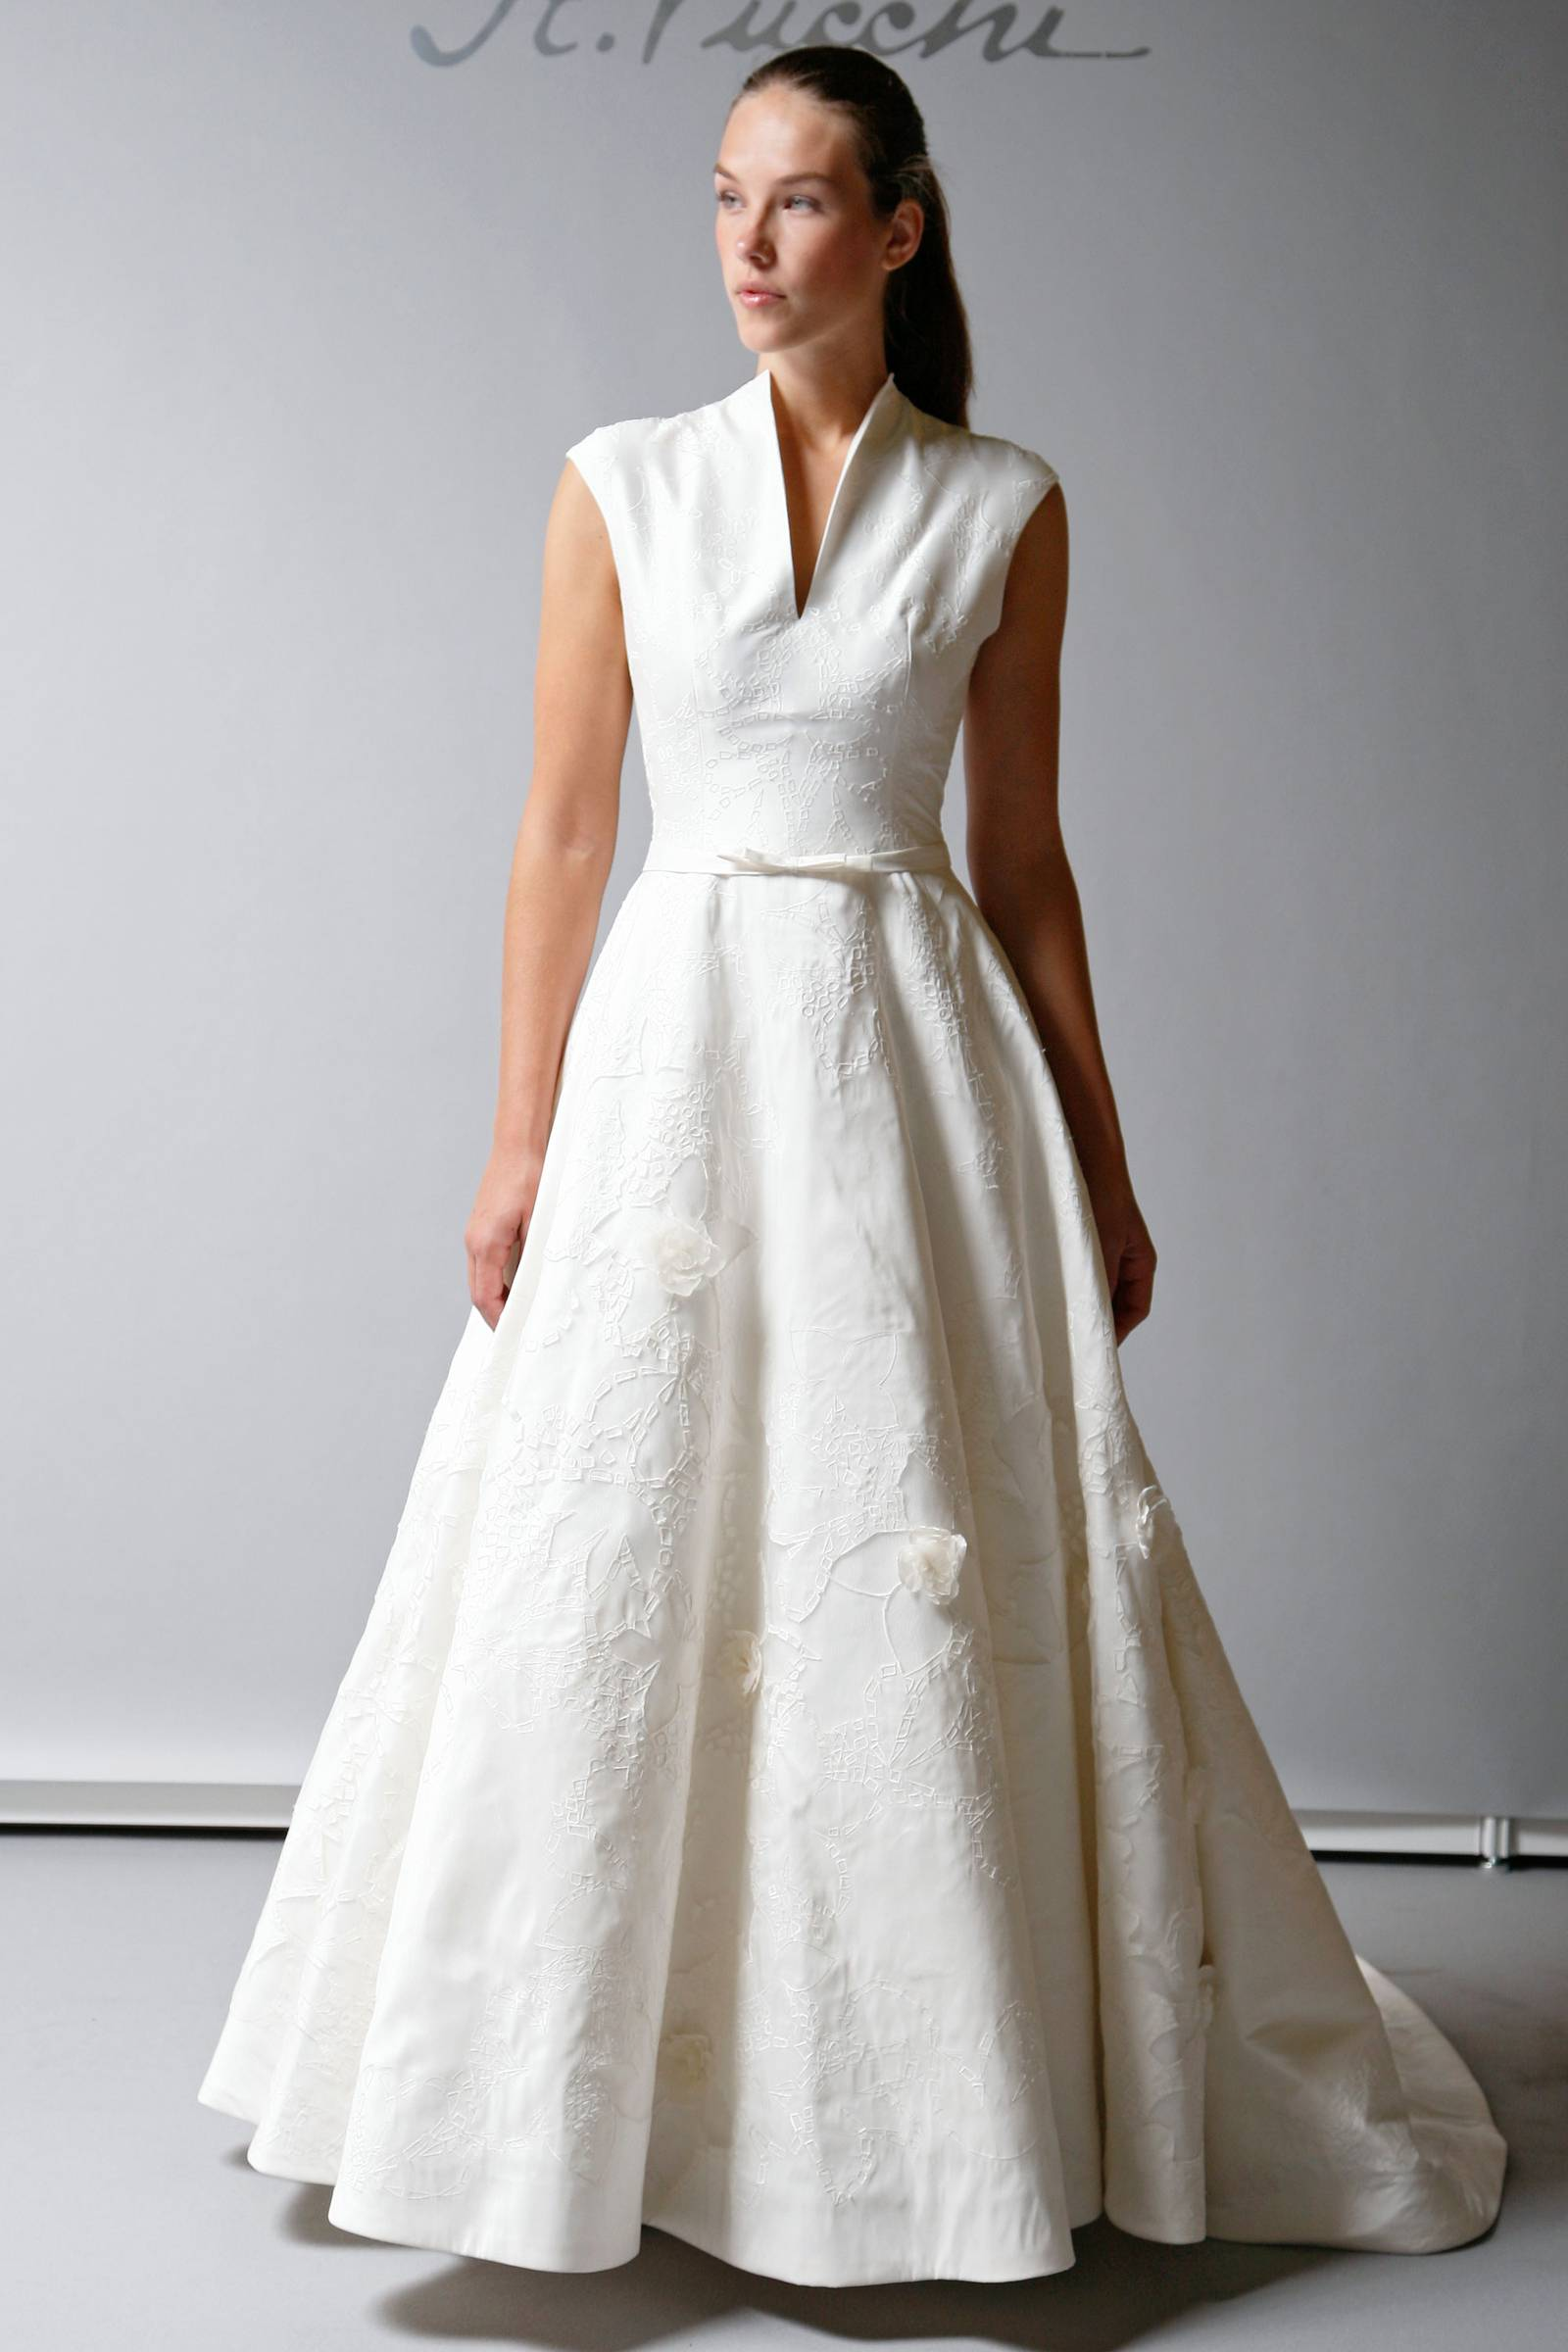 2013 Wedding Dress St Pucchi Bridal Modest Cap Sleeve A Line